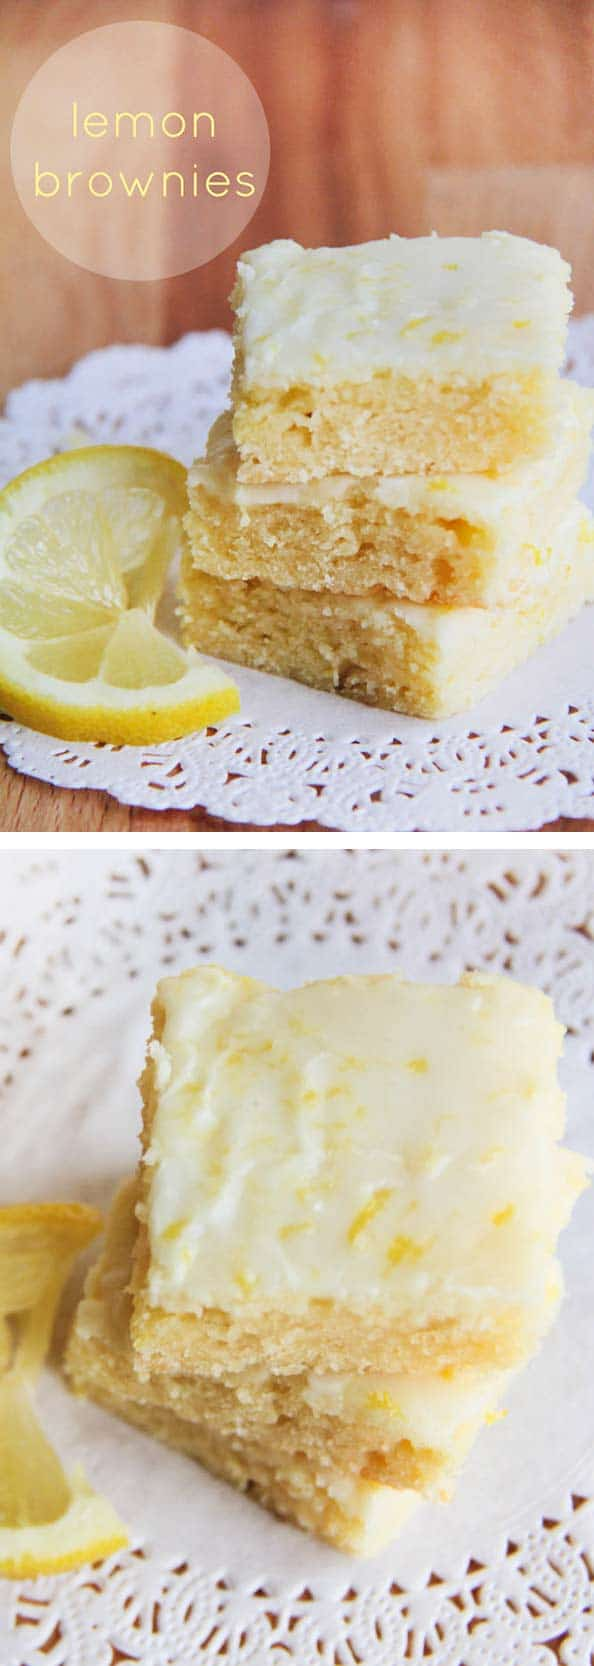 Lemon brownies AKA lemon blondies -super soft bars topped with the most delicious lemon glaze. The perfect summer dessert.